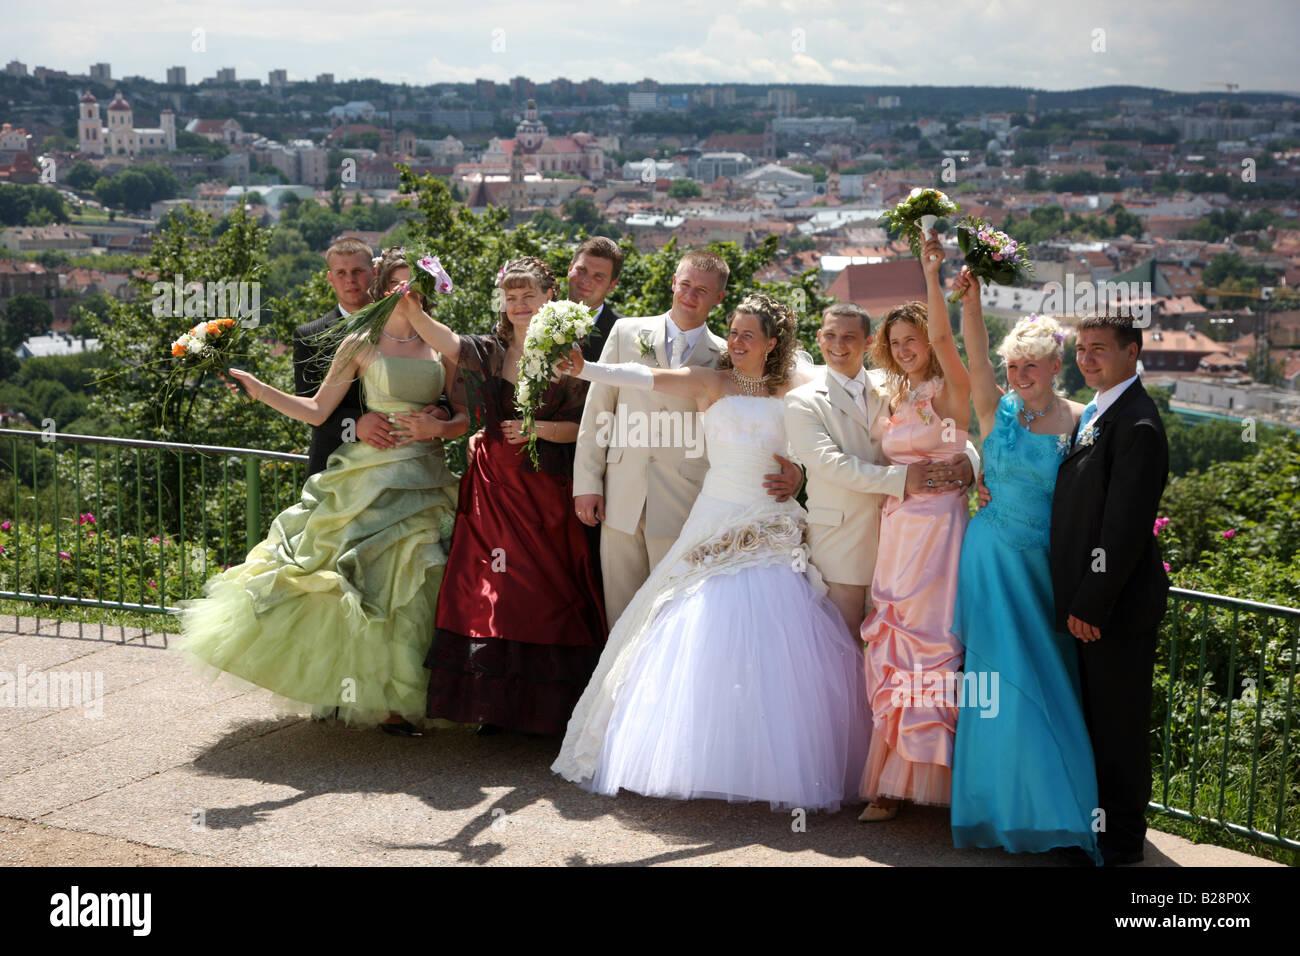 LTU Lithuania Capital Vilnius Wedding photo shooting on Kalnu hill Stock Photo